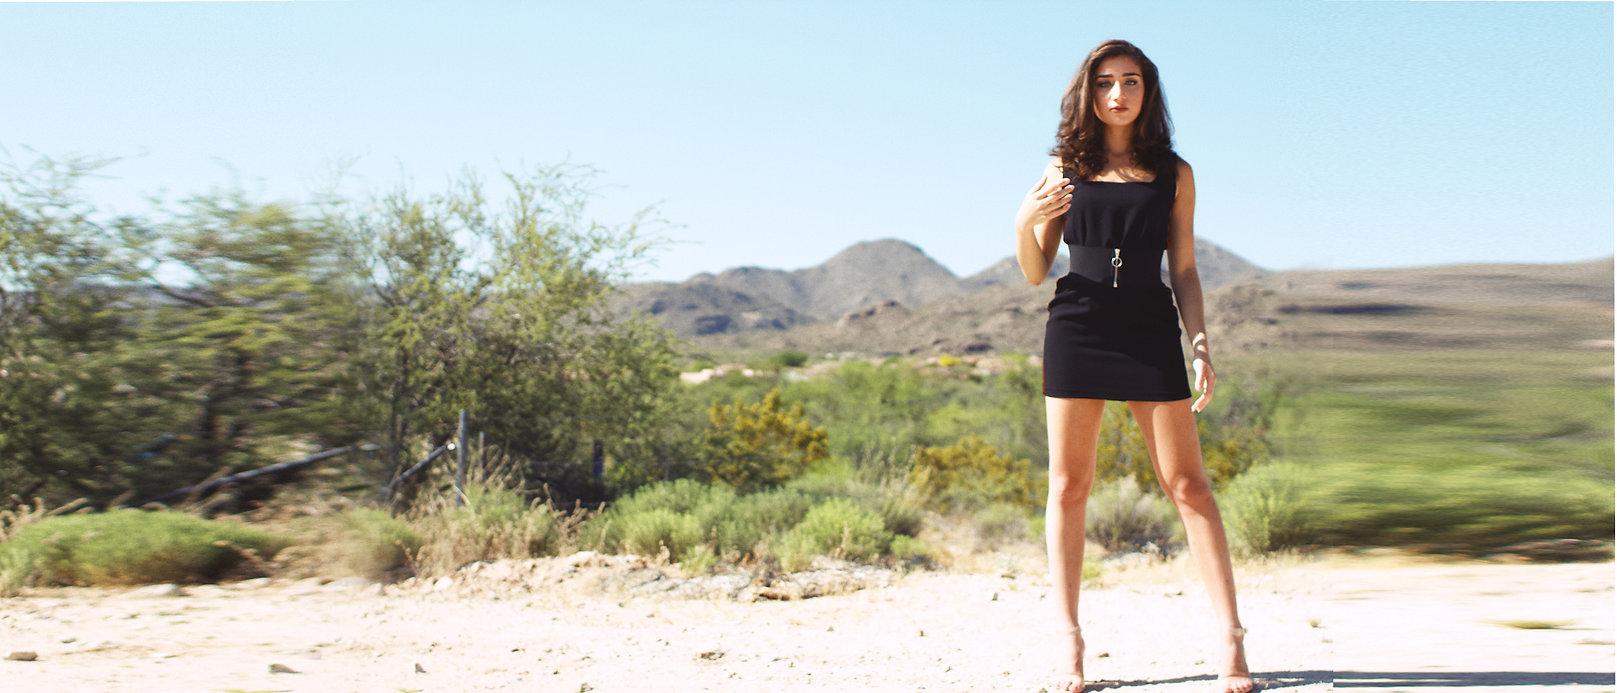 Halle Abadi in the desert.